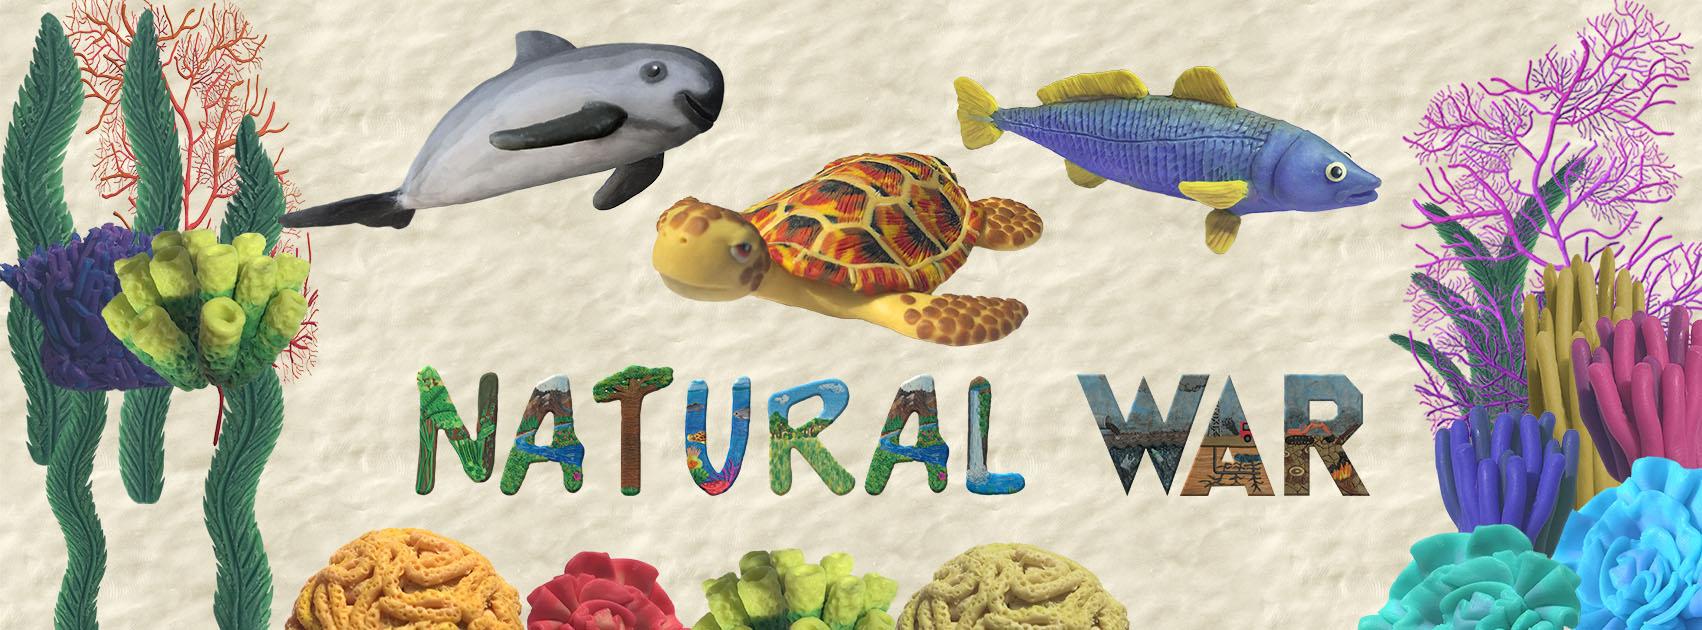 Natural War